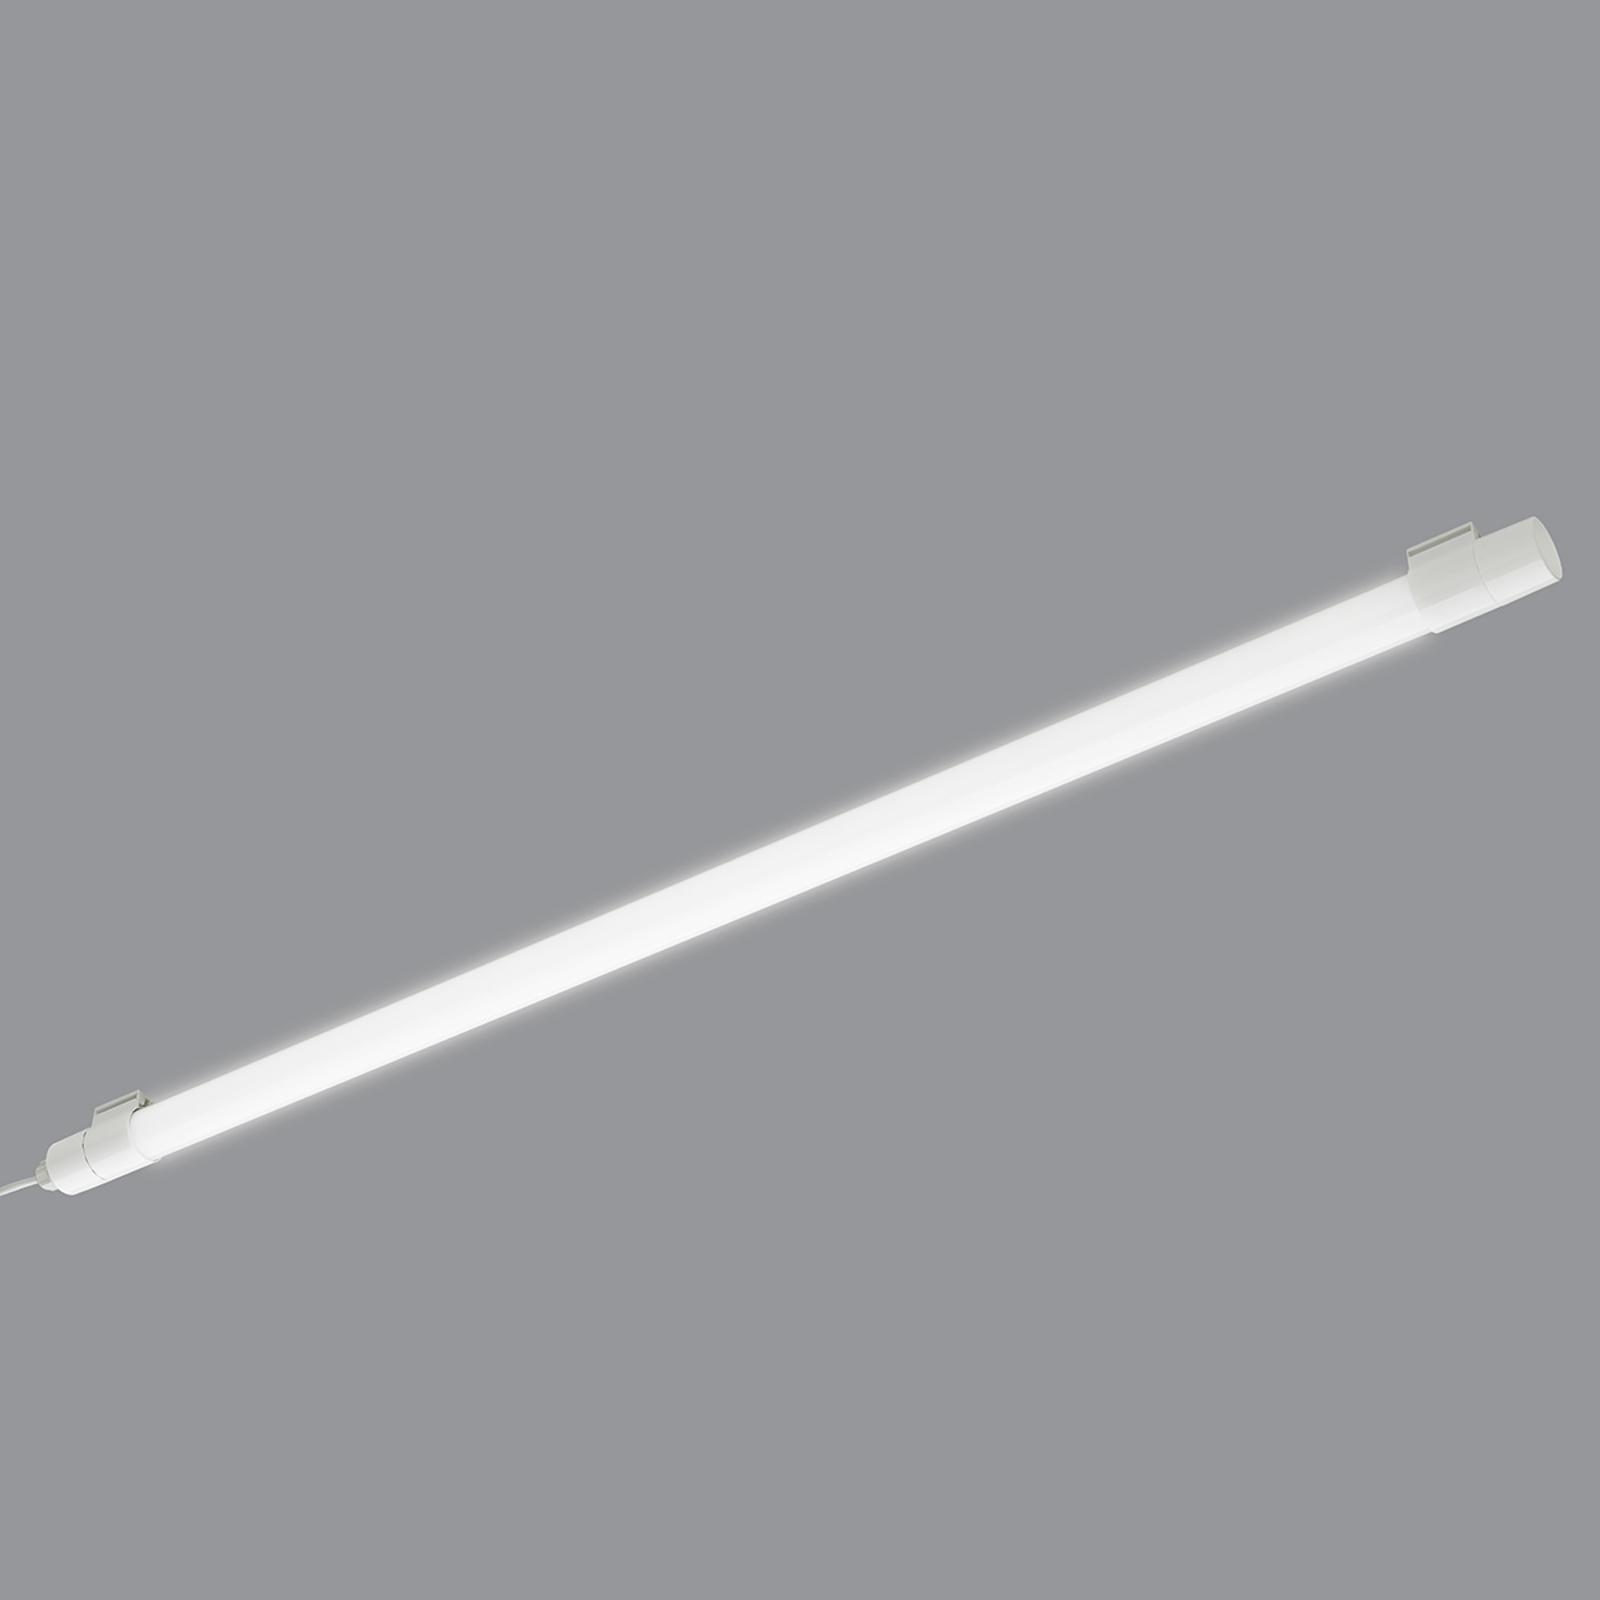 LED-Lichtleiste Start Batten IP65, 26 W, 3.000 K